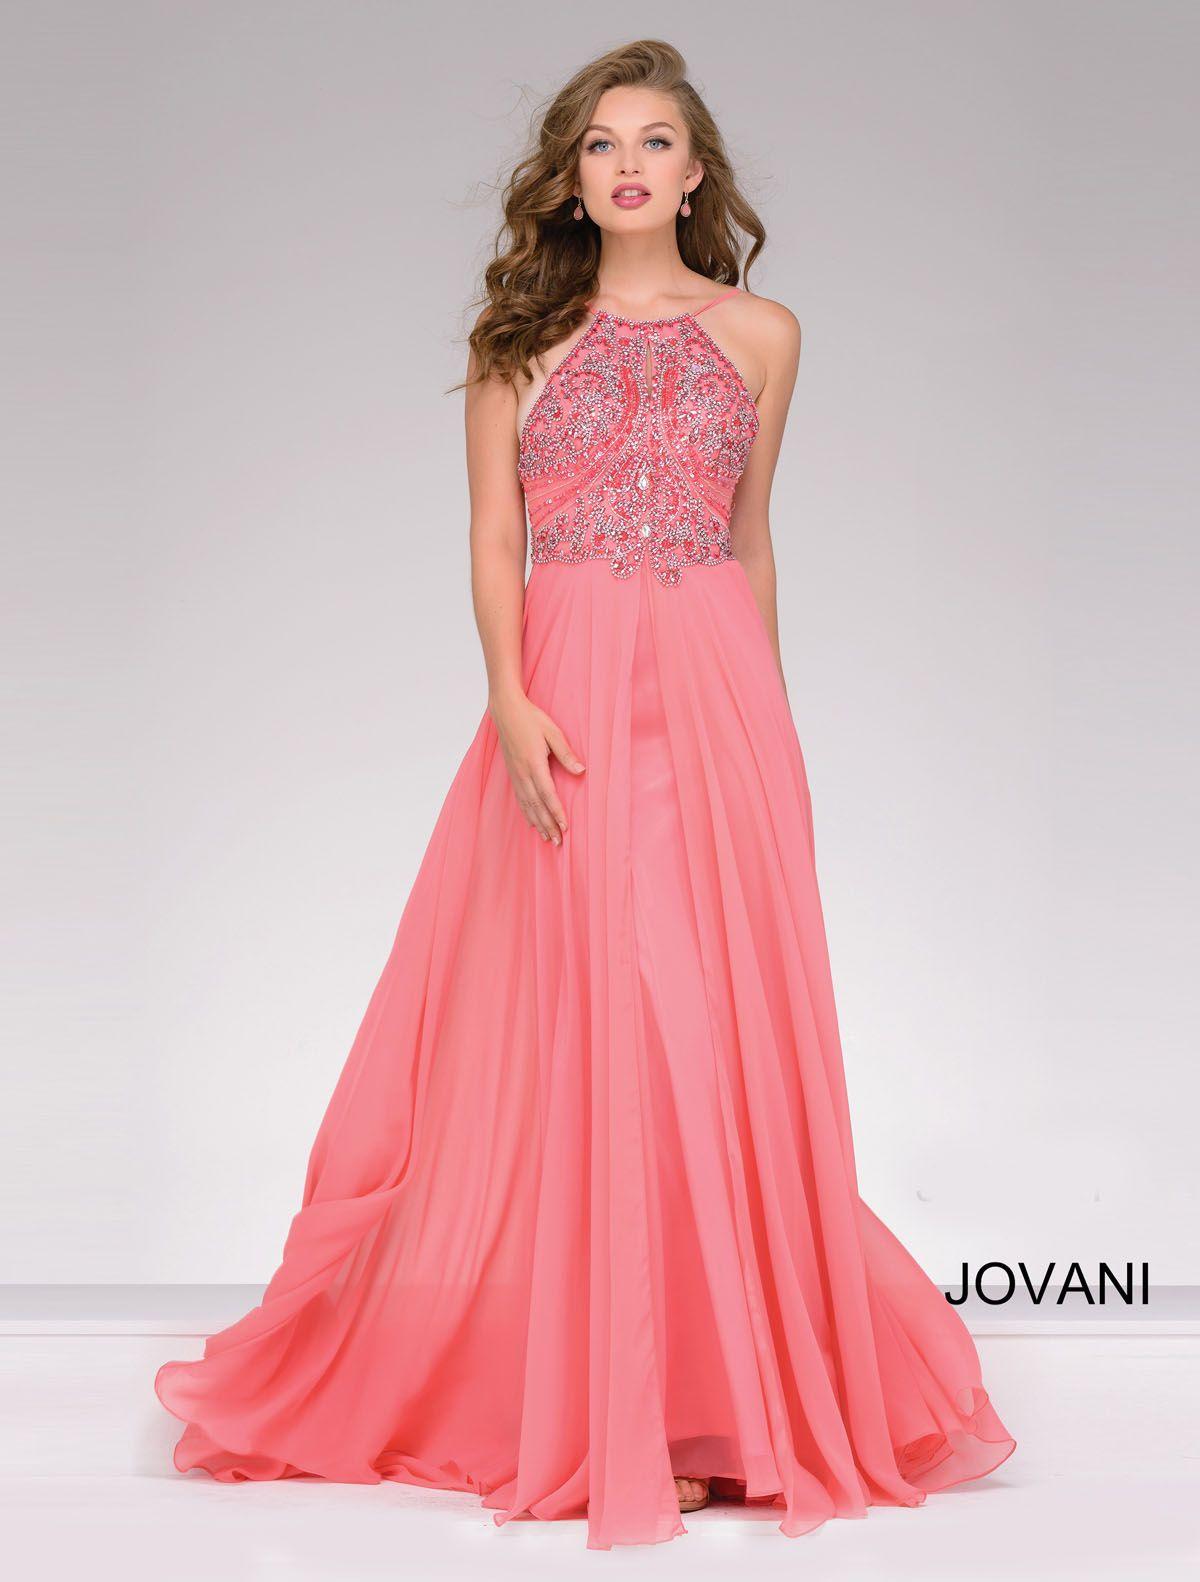 Jovani 92605 - International Prom Association #promdress #dresses ...